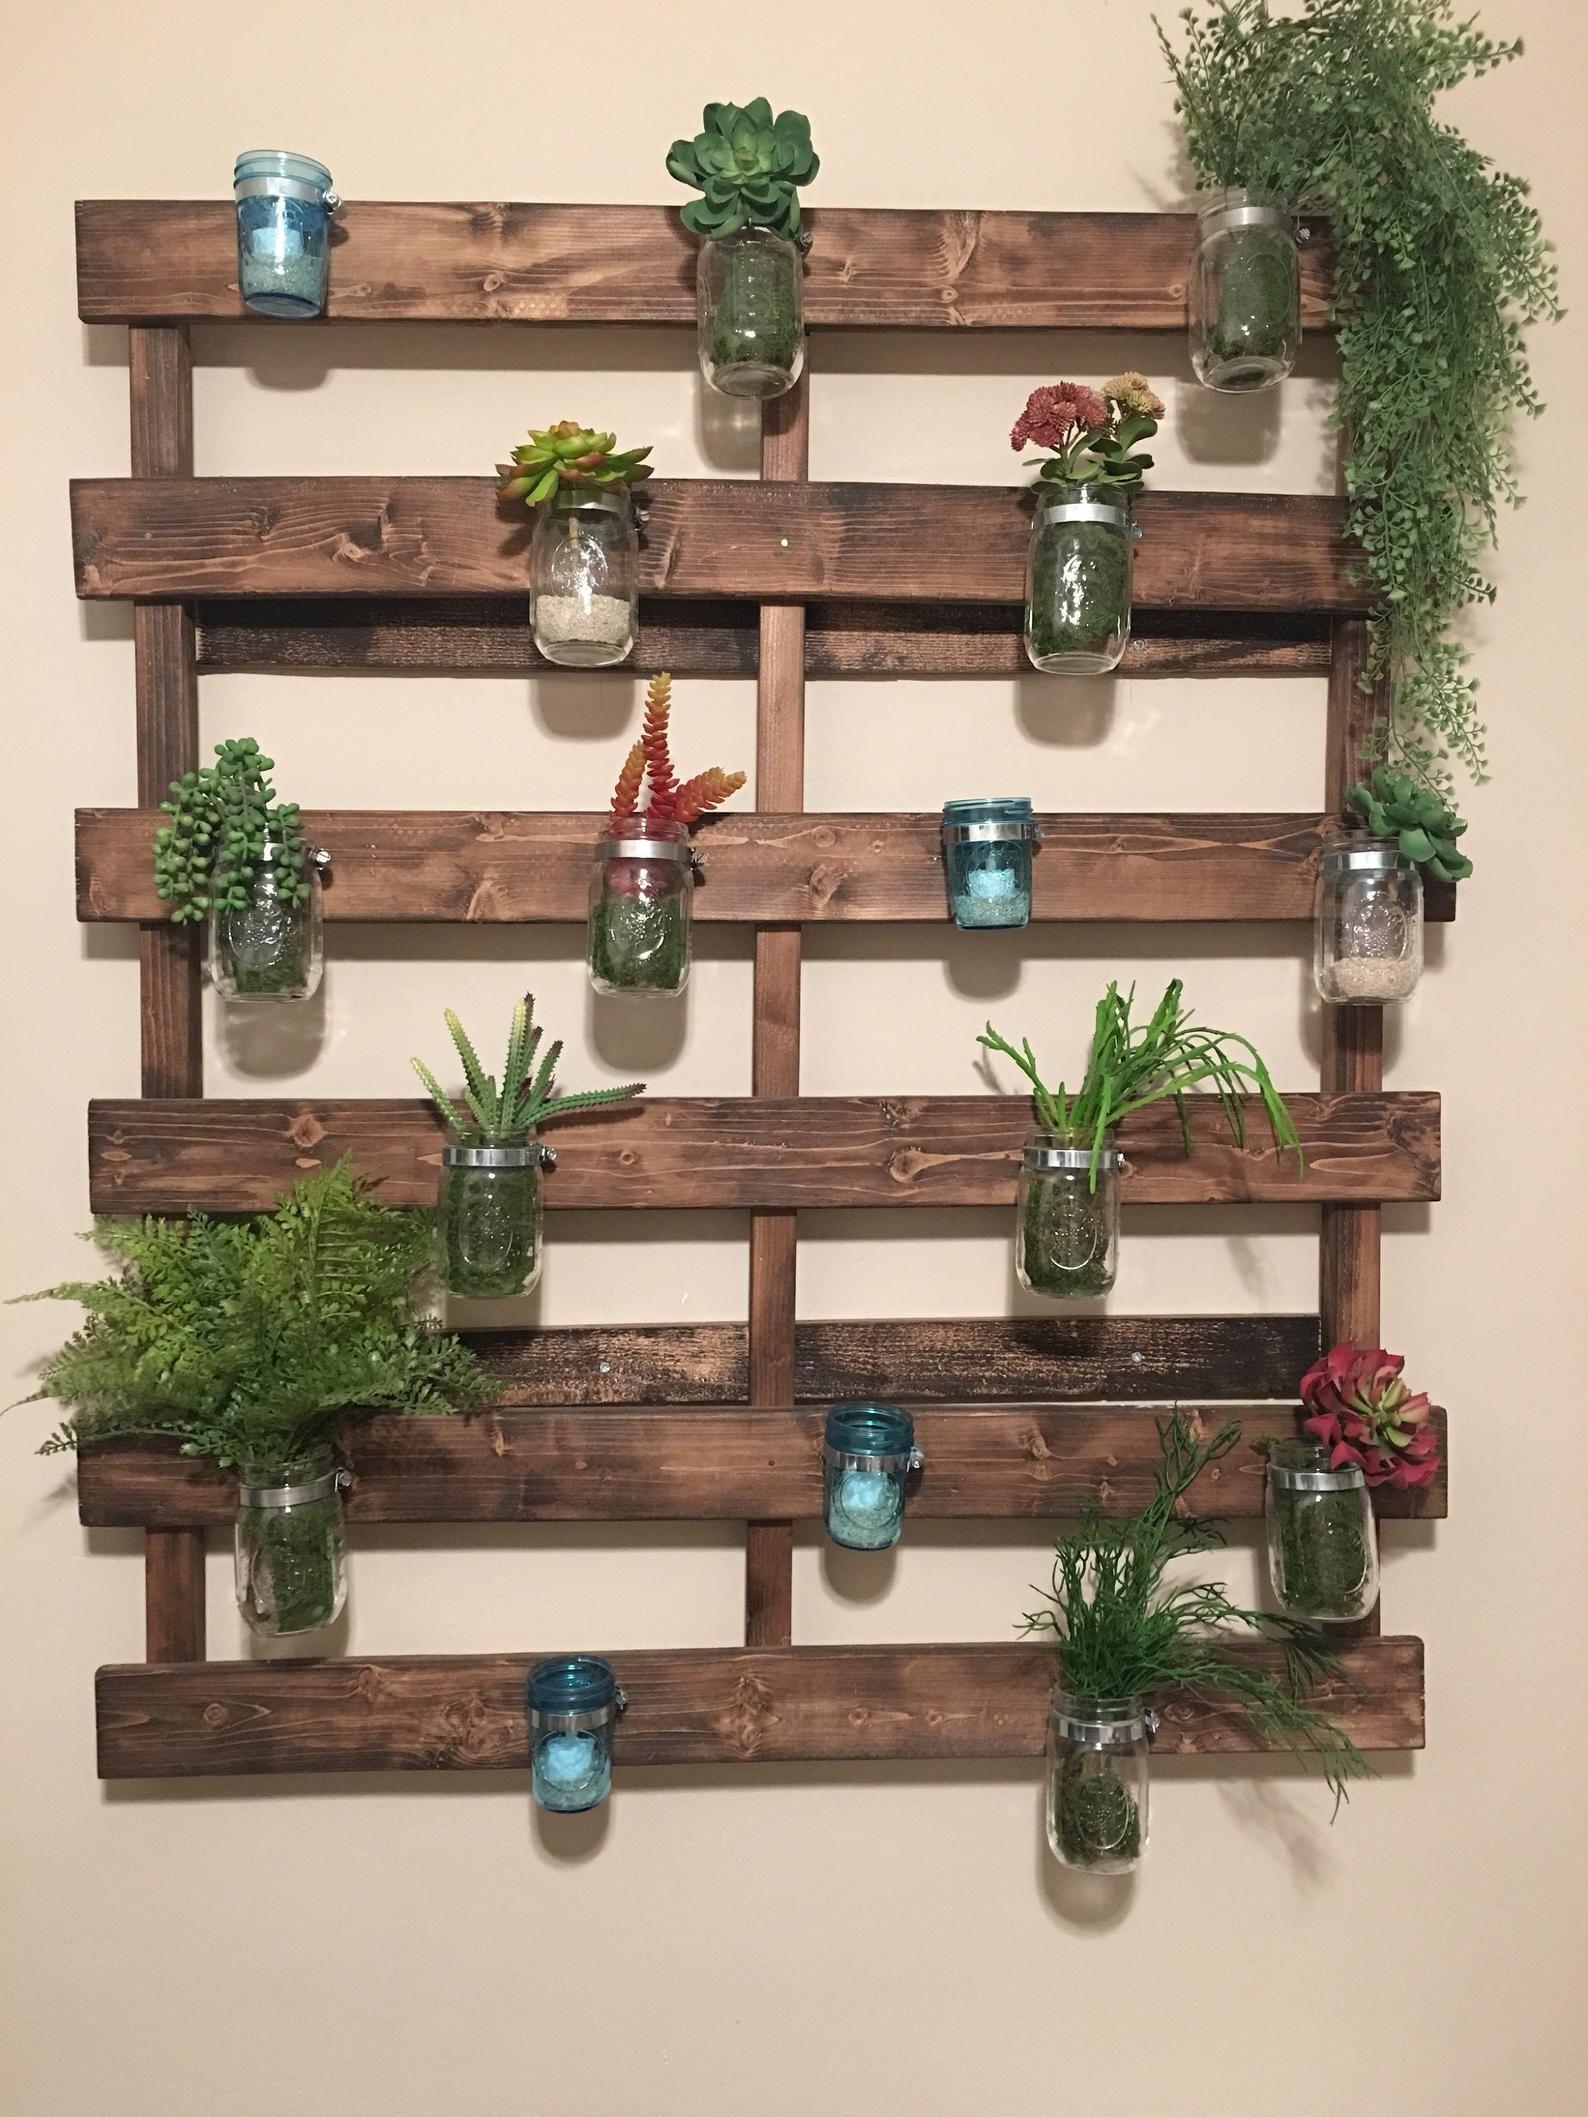 Wood Pallet Mason Jar Hanging Garden Garden Wall Decor Hanging Garden House Plants Decor